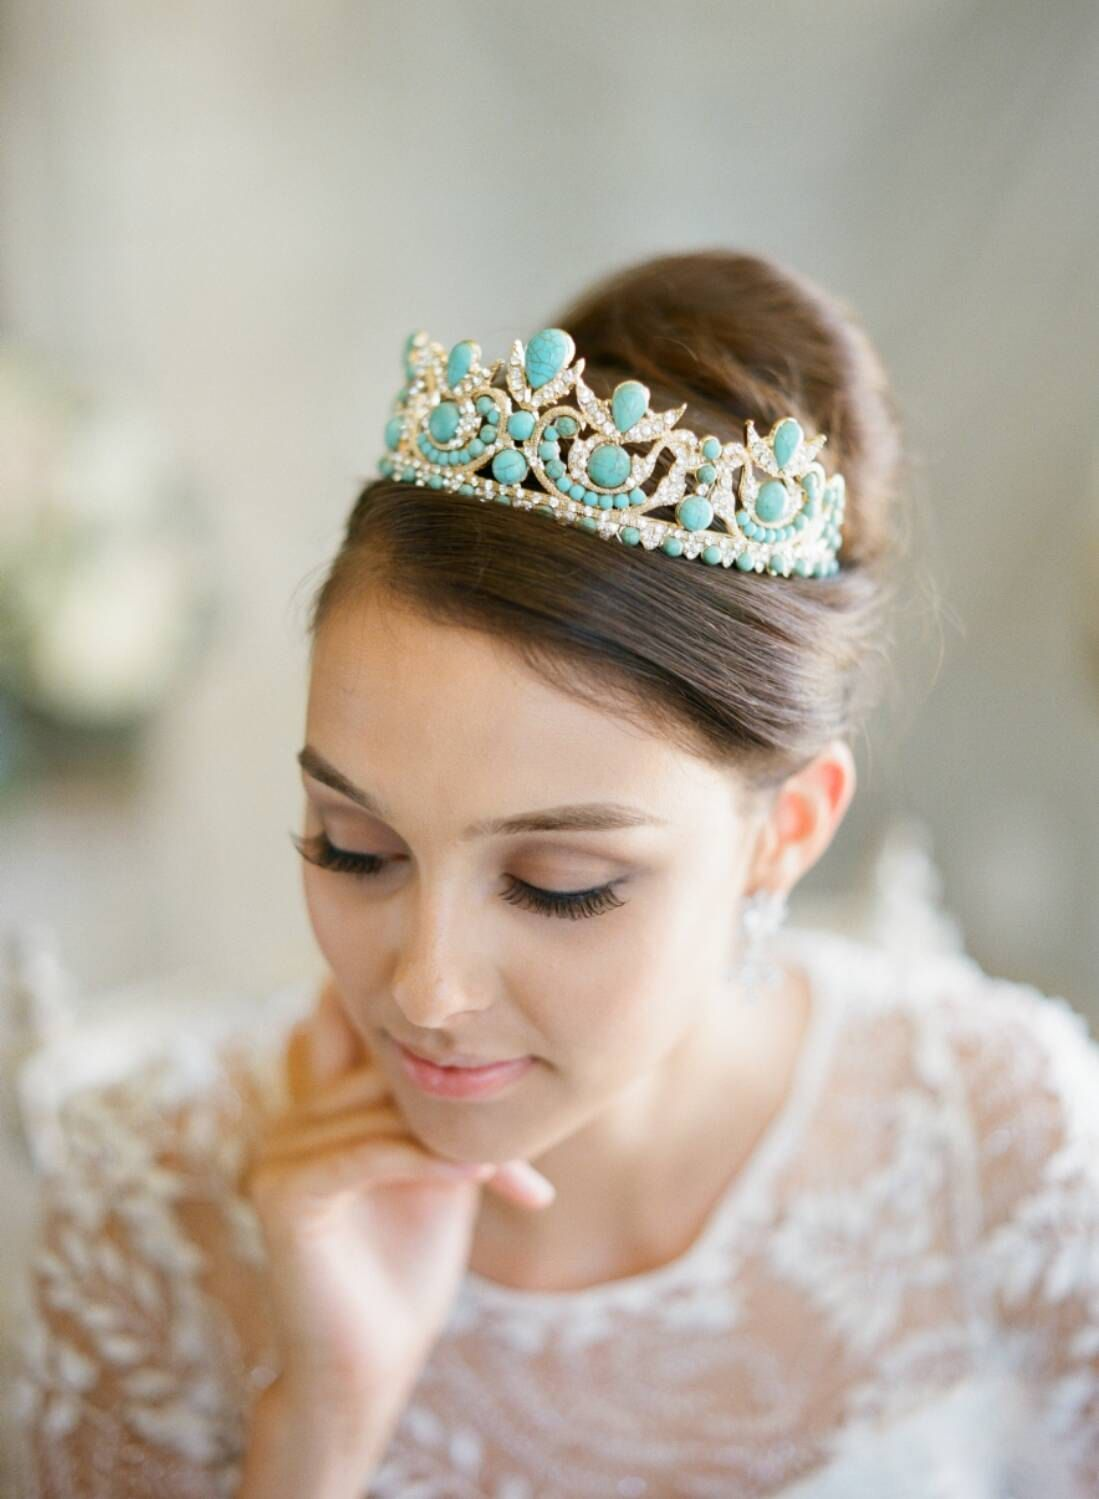 Bridal tiaras and veils - Gold Bridal Crown Turquoise Tiara Aria Blue Bridal Tiara Gold Byzantine Wedding Tiara